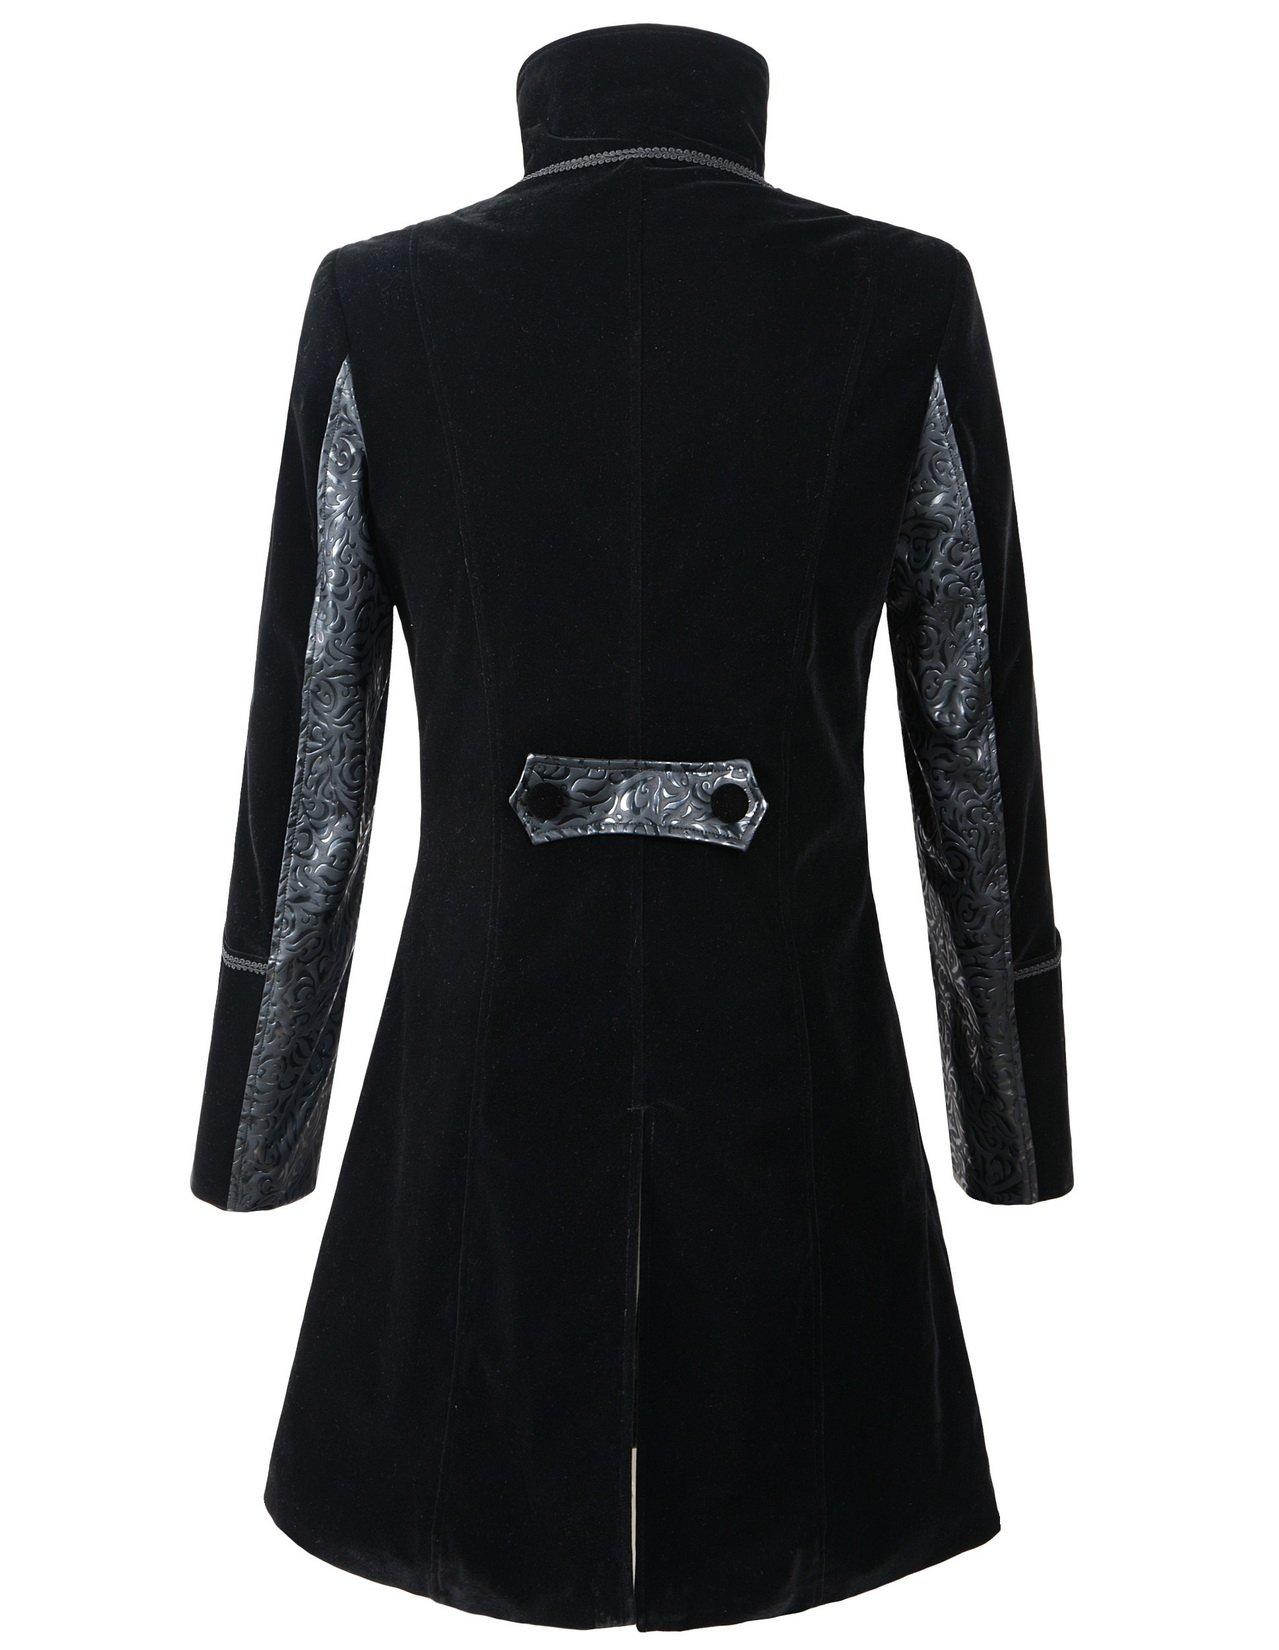 DarcChic Mens Velvet Gothic Leather-Lapel Trench Coat Steampunk Victorian 4